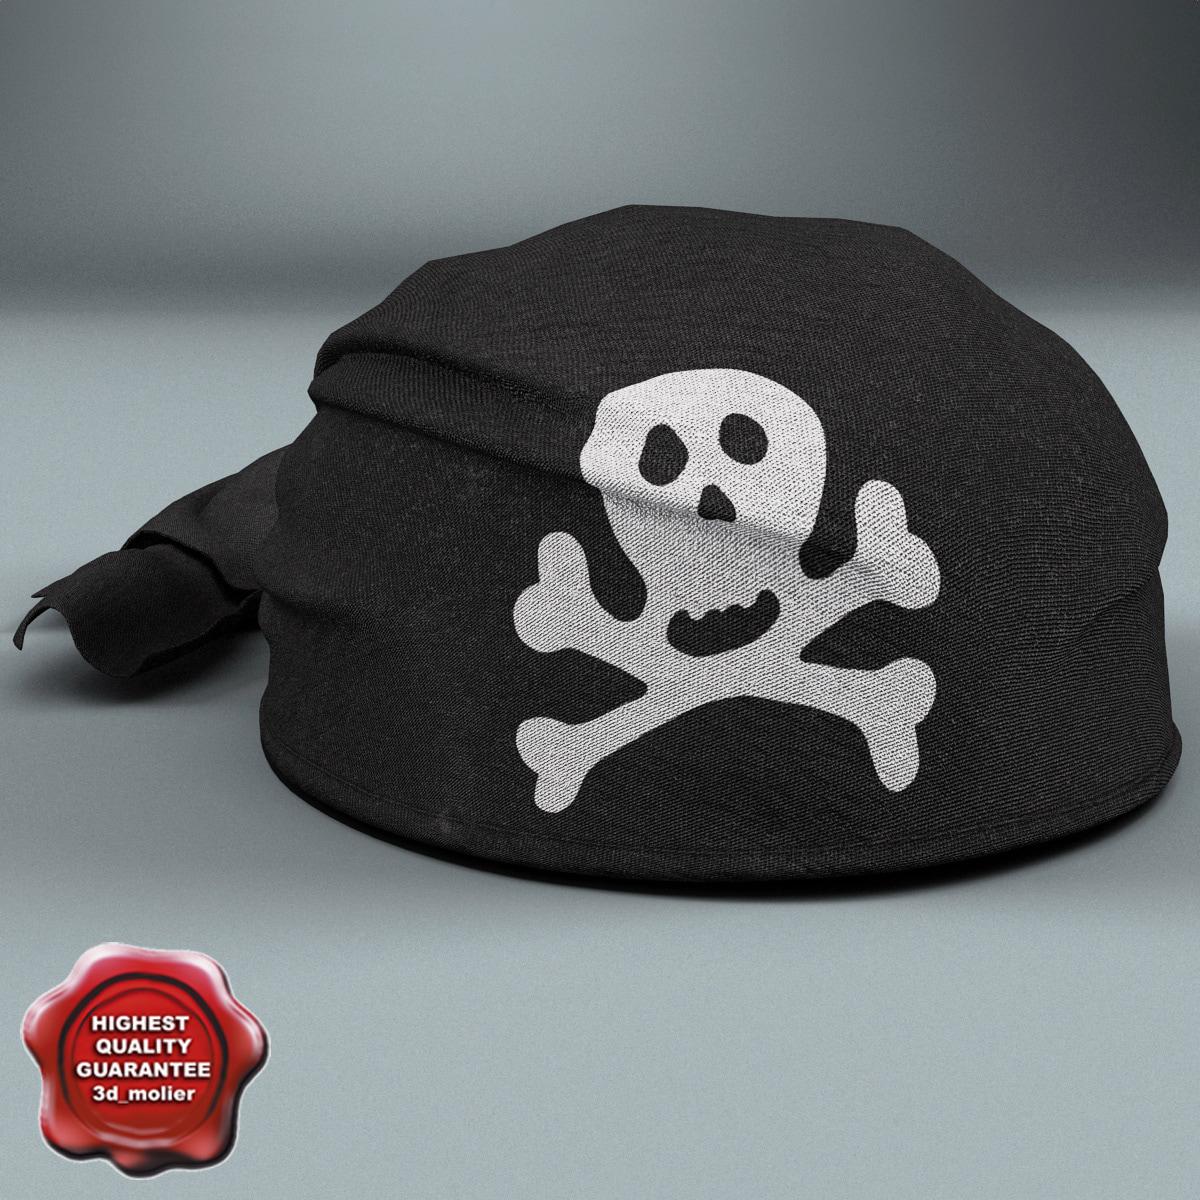 Pirate_Scarf_Hat_Black_00.jpg